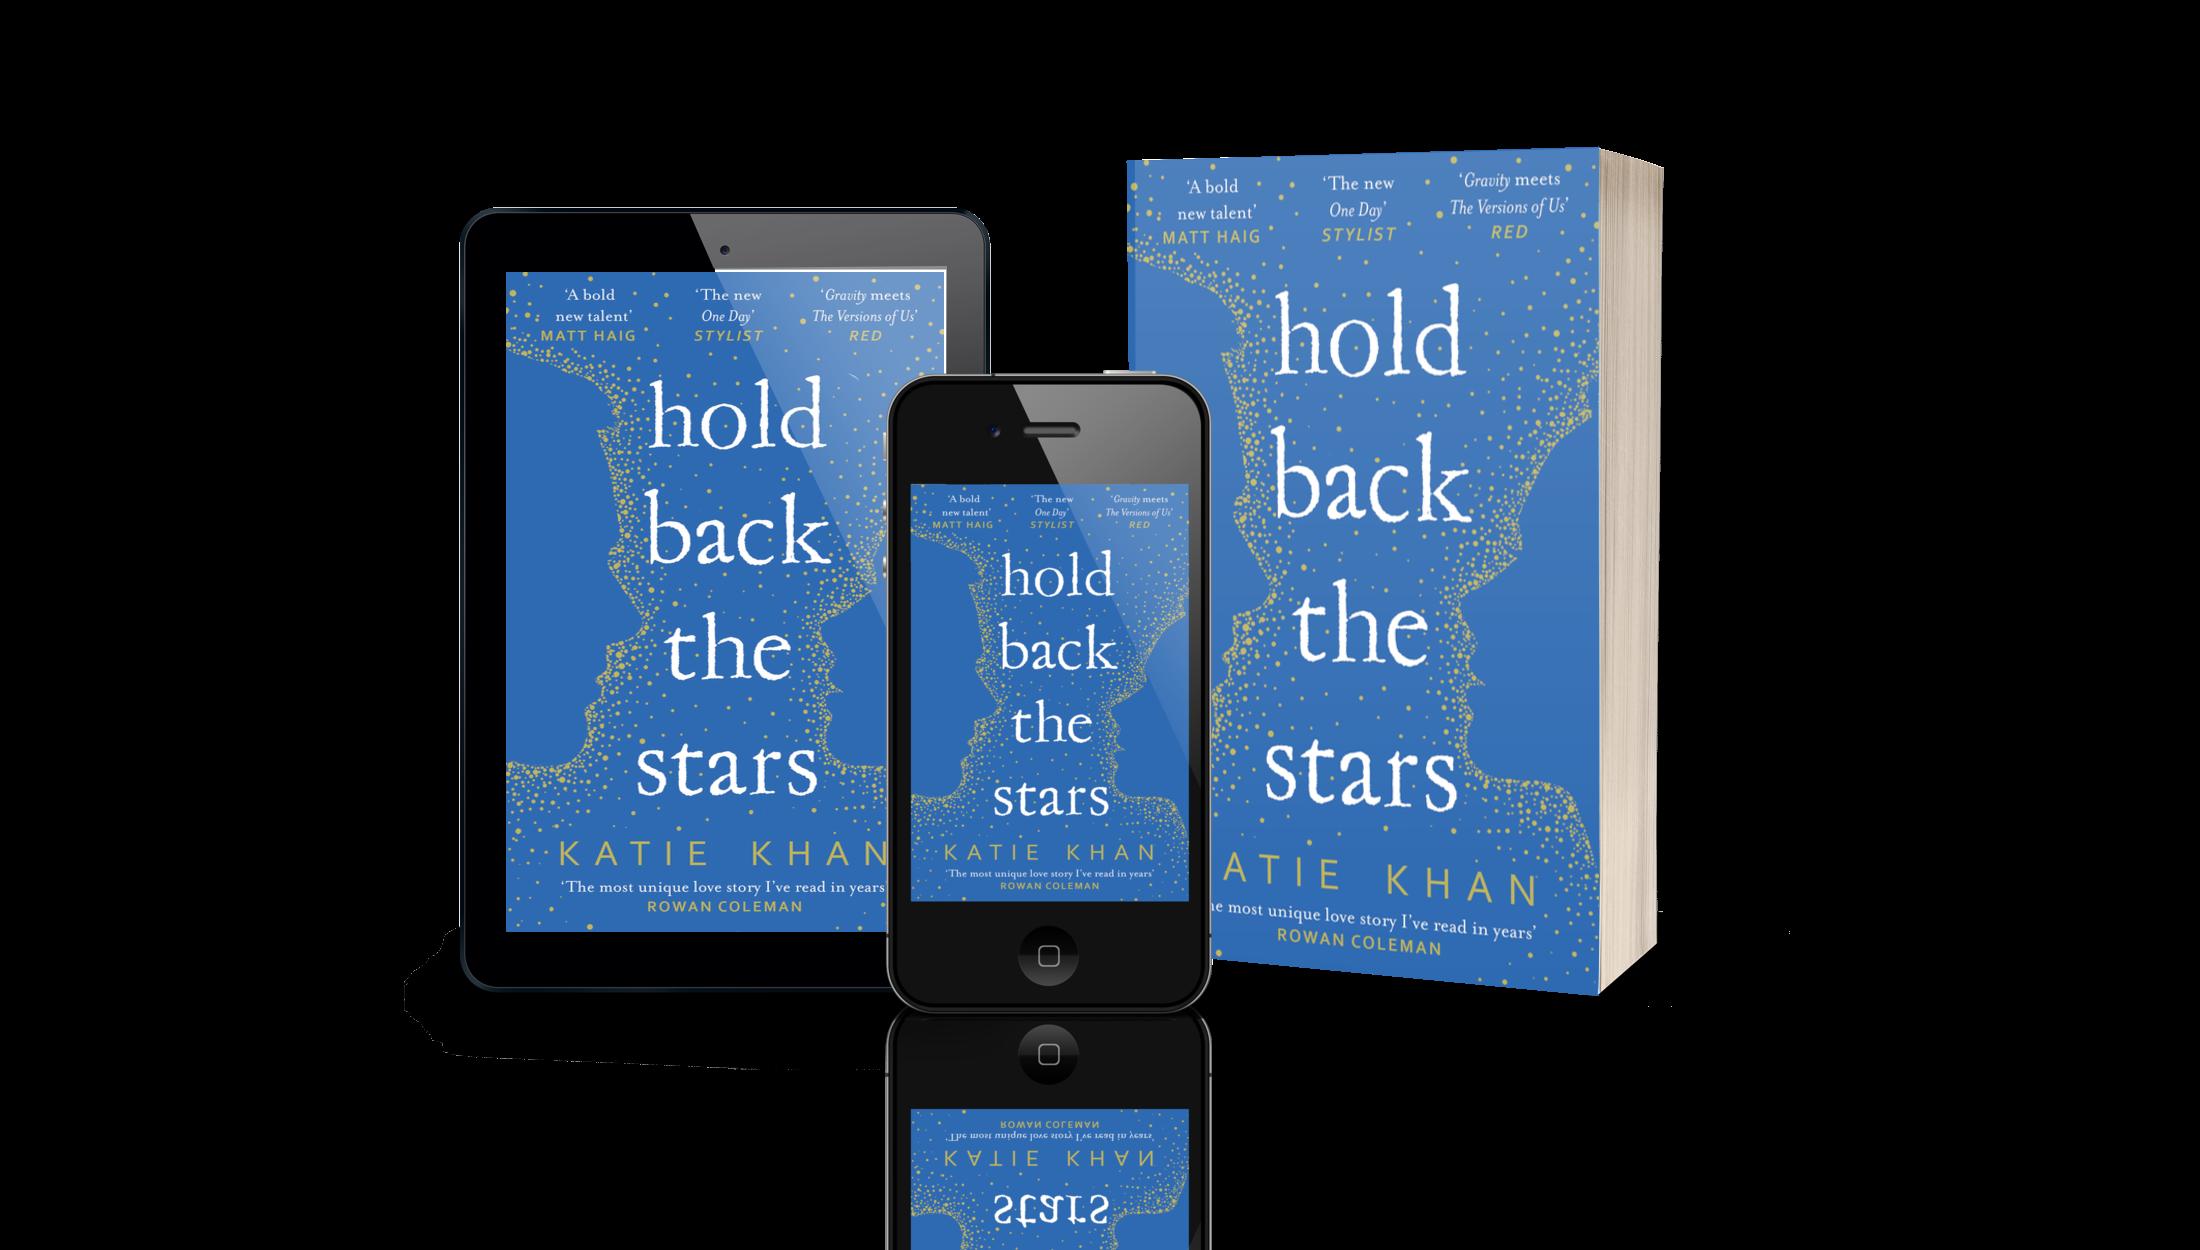 holdbackthestars_novel_katiekhan_ebook_audiobook.png